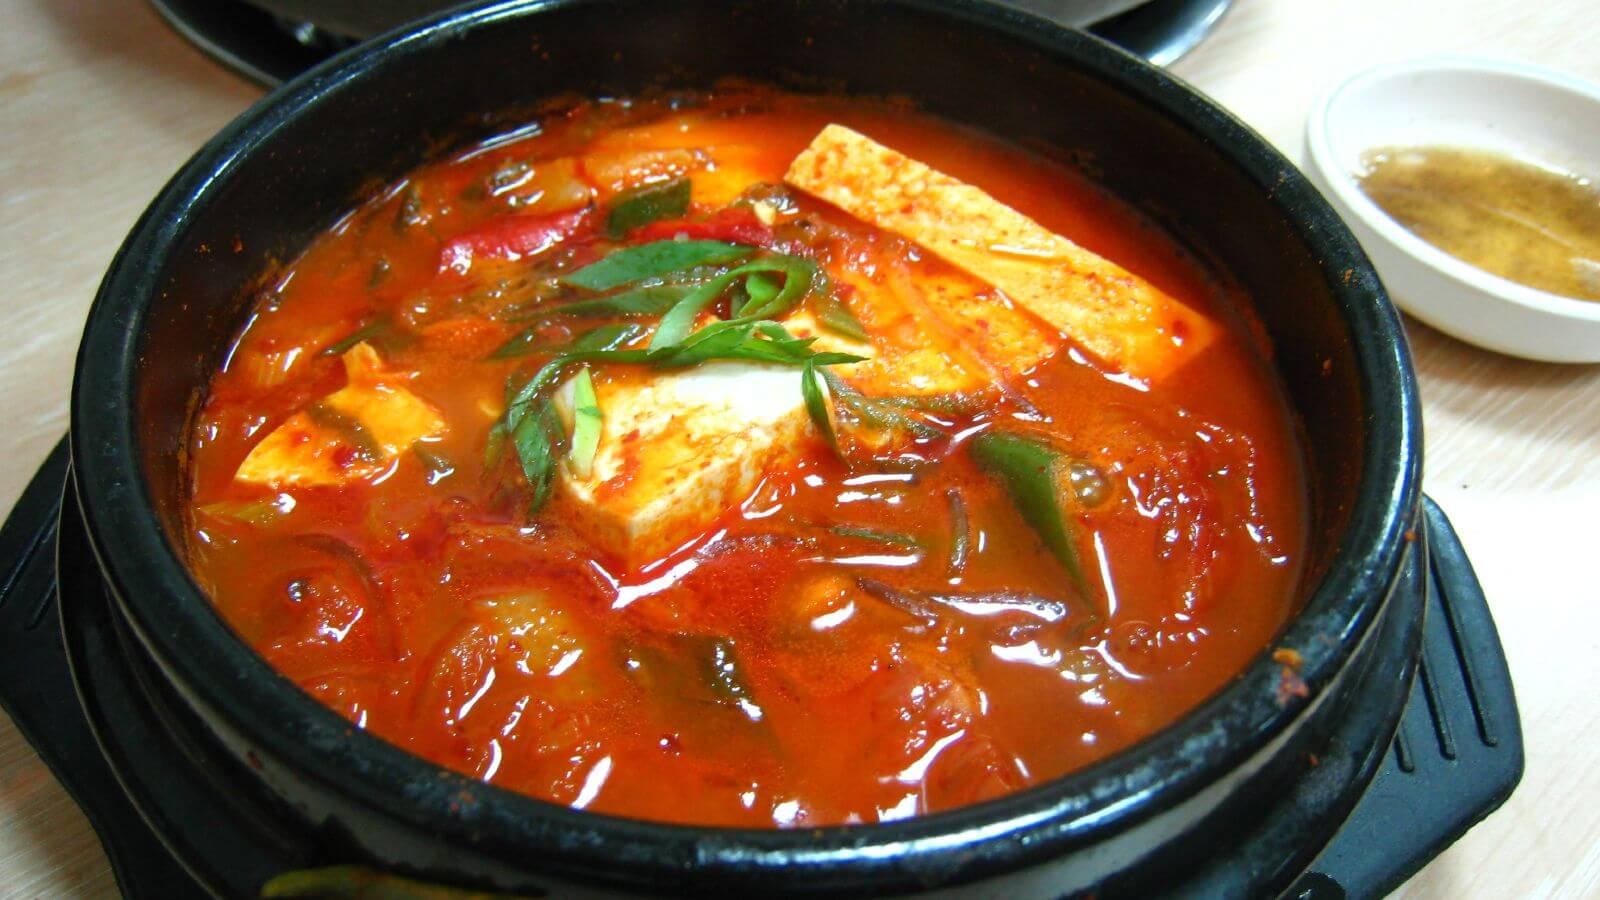 Kimchi Jjigae Seoul South Korea Food Tour